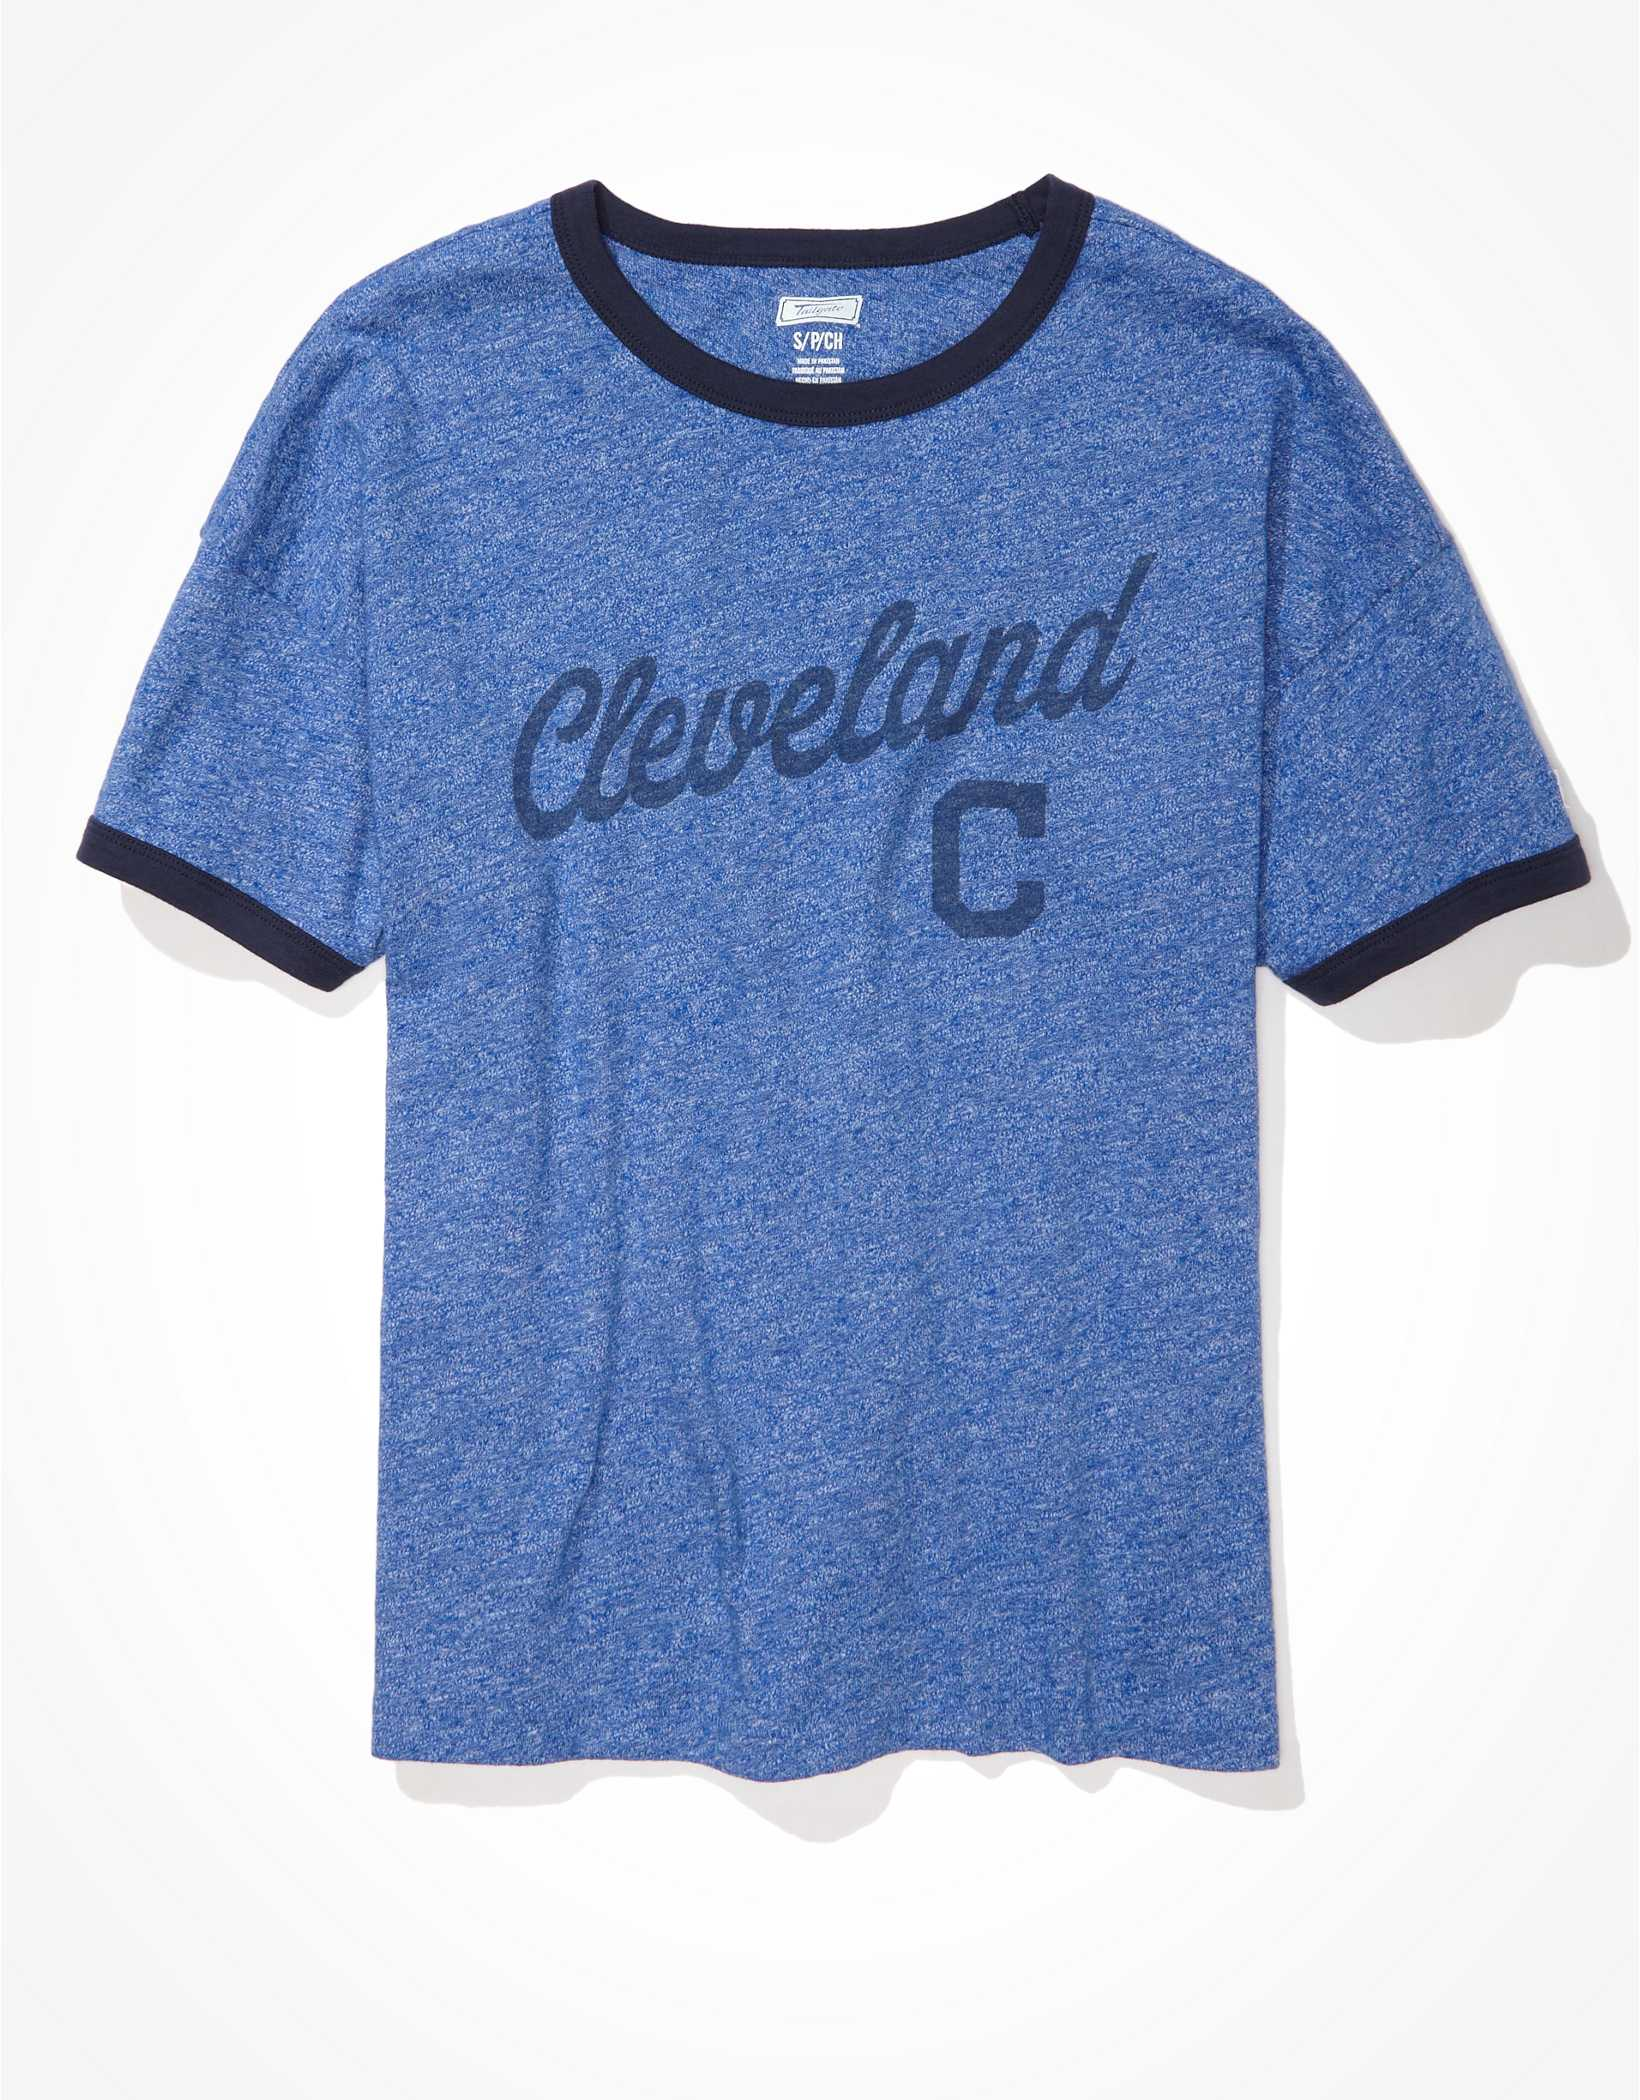 Tailgate Women's Cleveland Indians Ringer T-Shirt